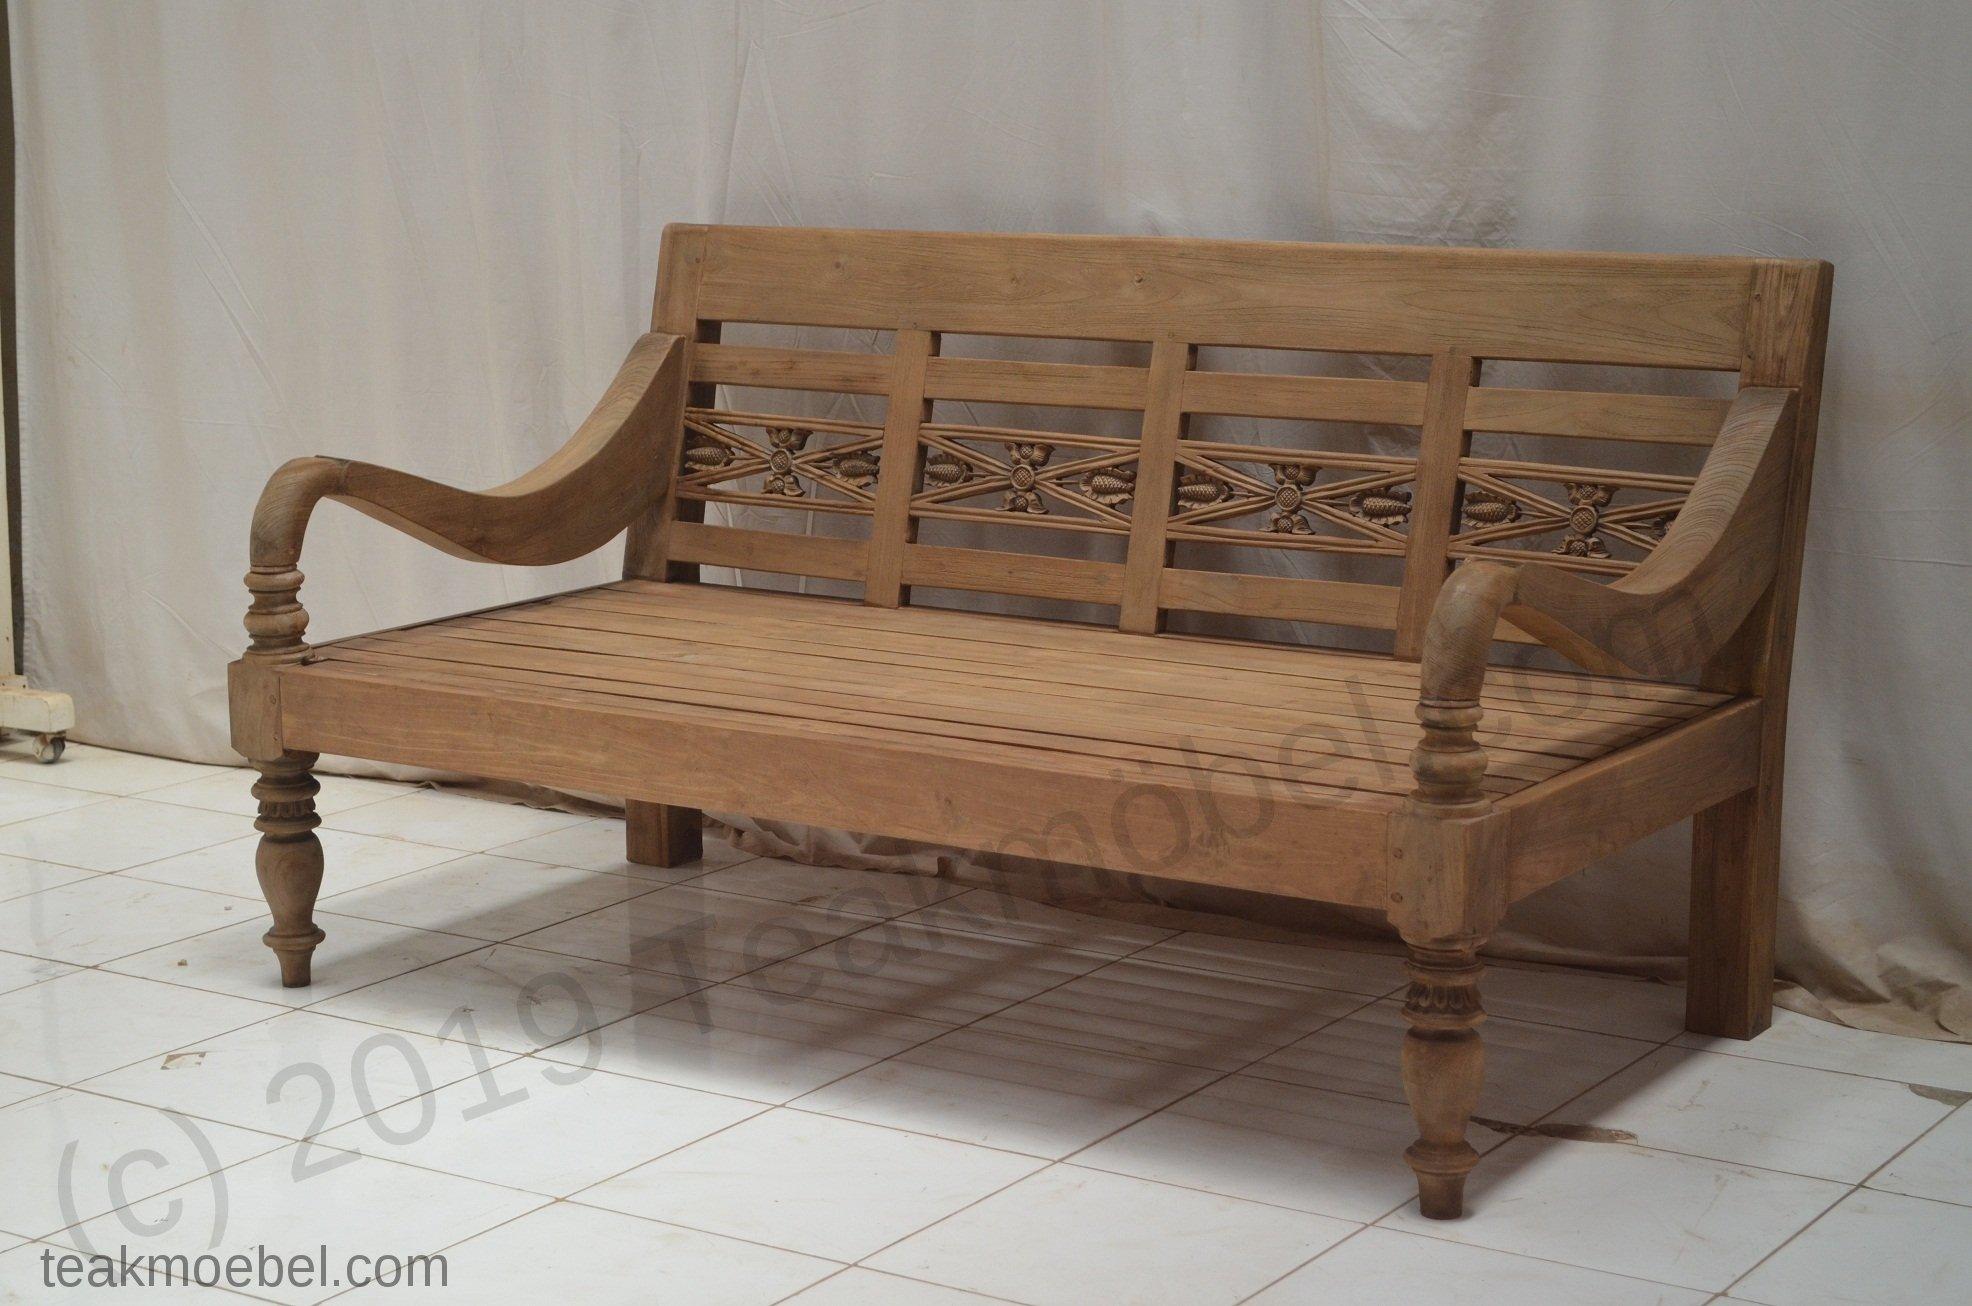 bahnhofsbank teak antik xl teakm. Black Bedroom Furniture Sets. Home Design Ideas